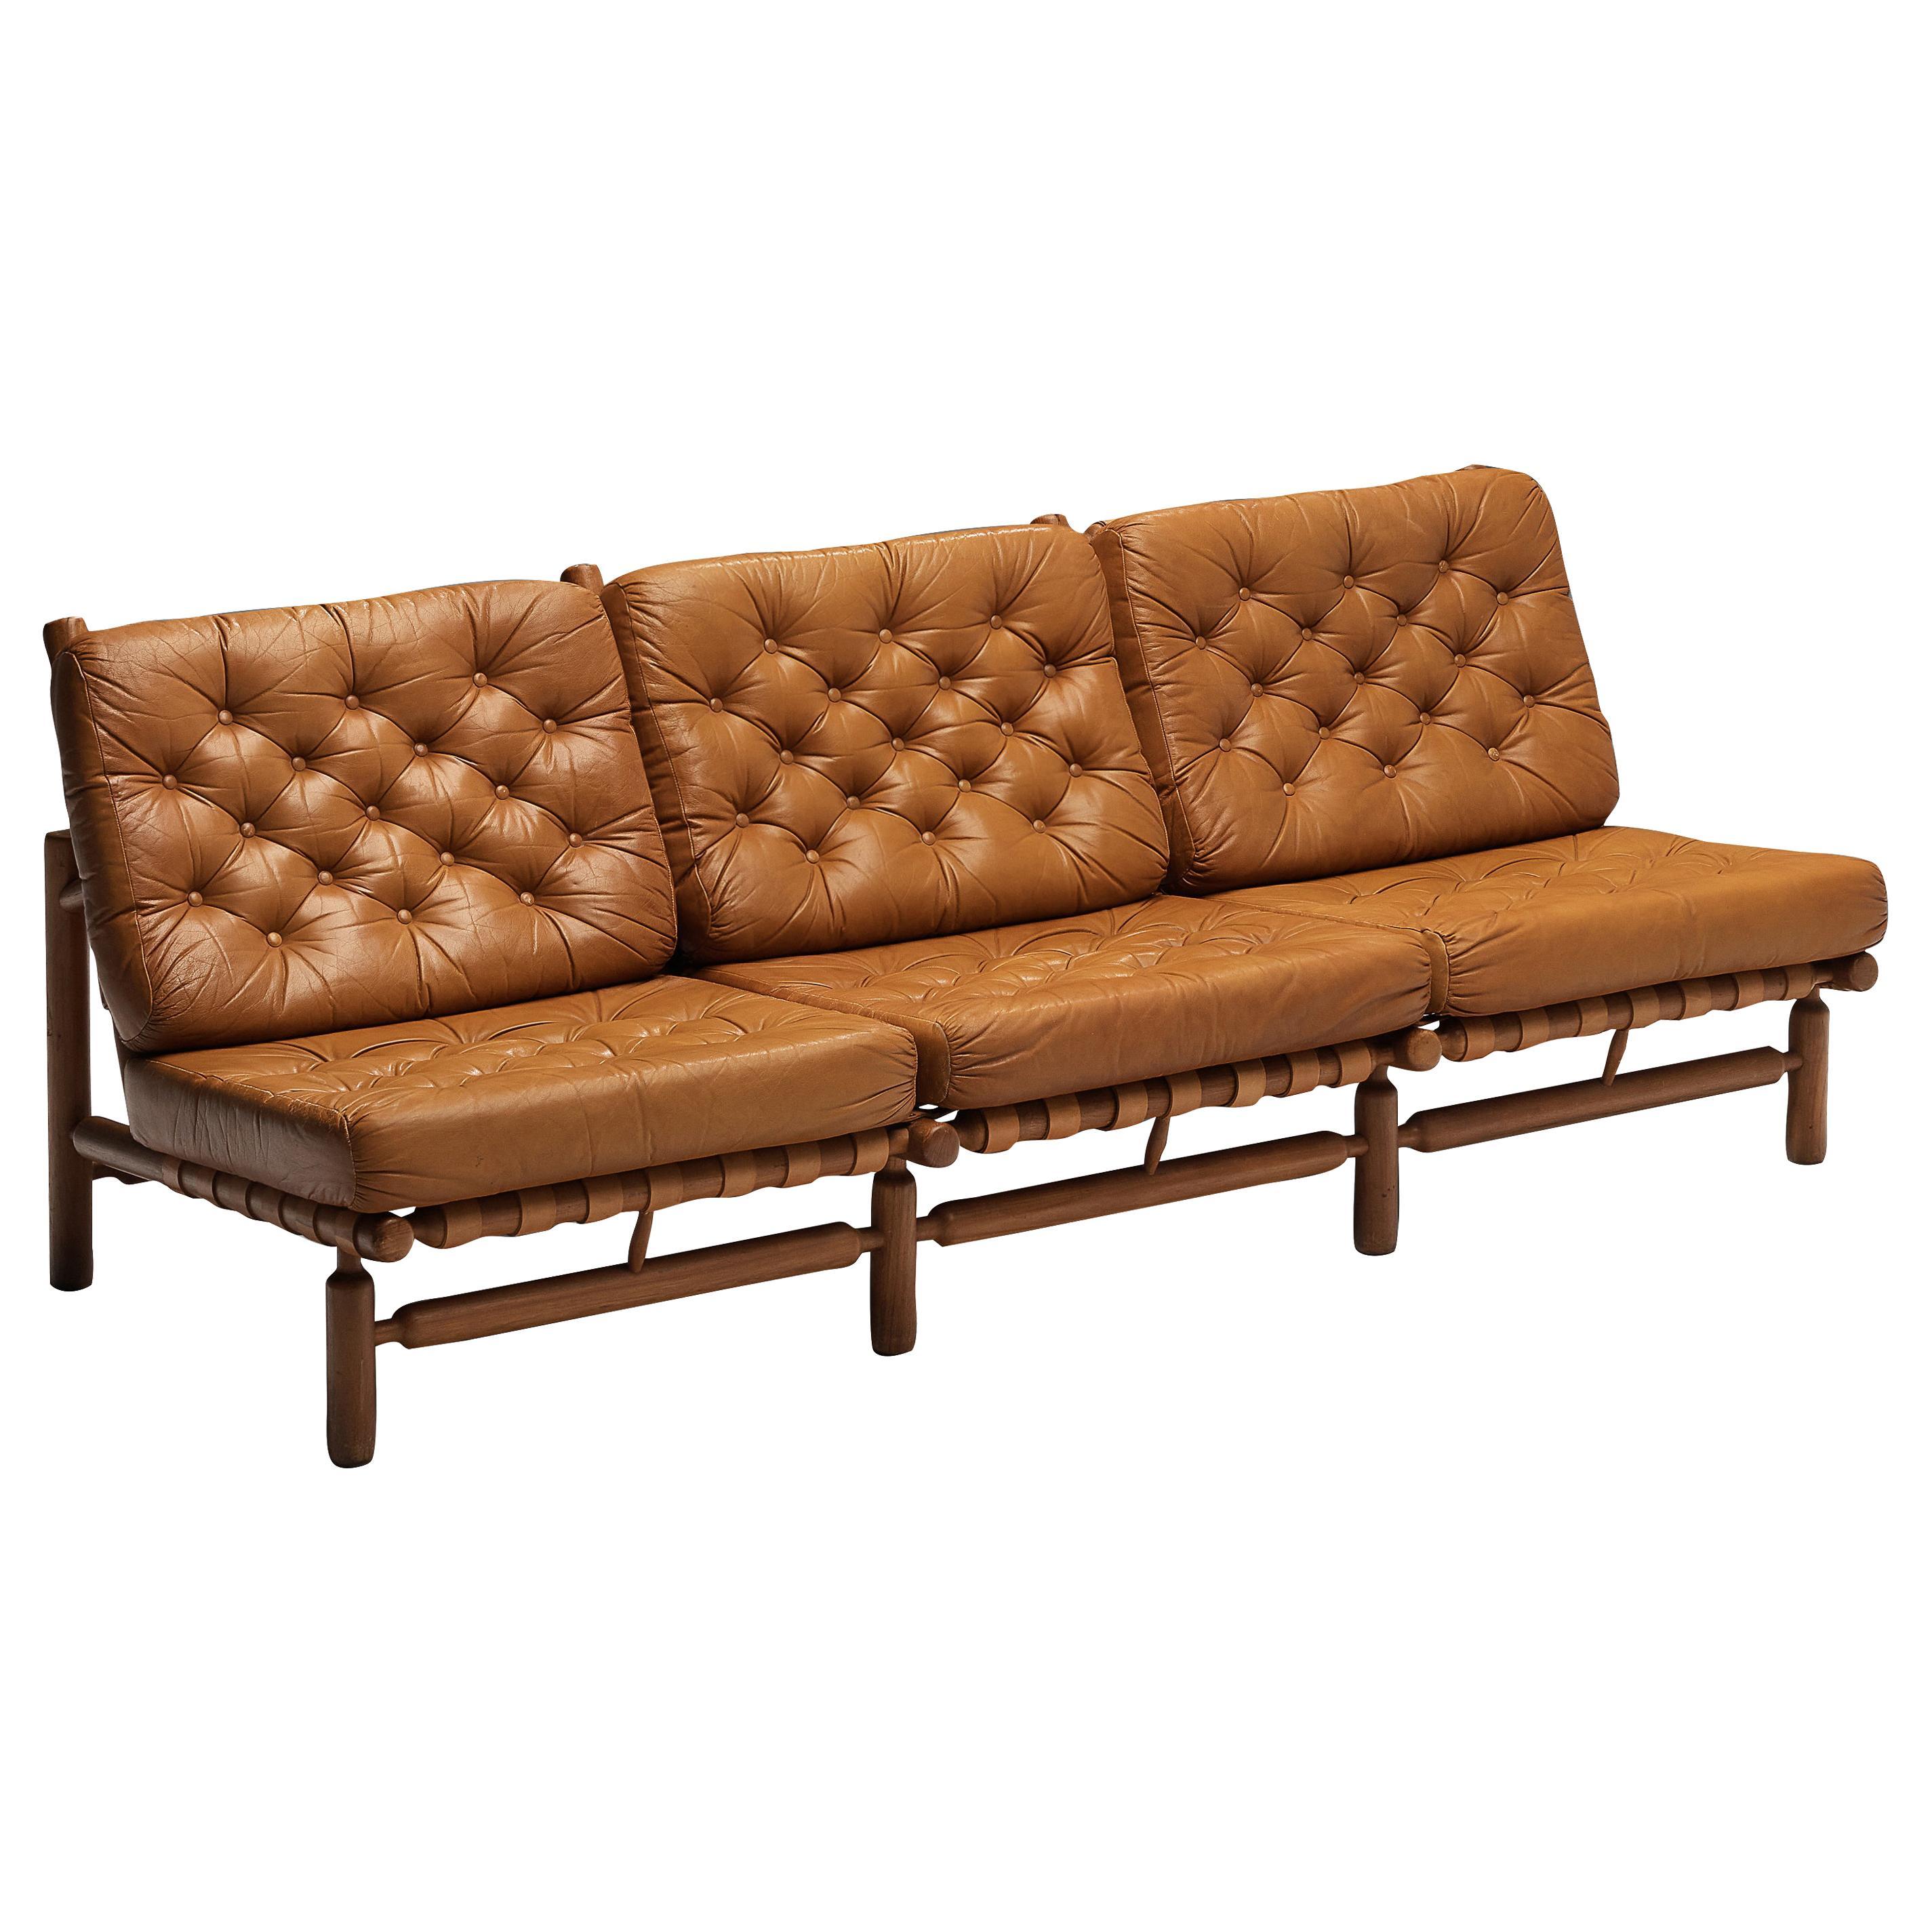 Ilmari Tapiovaara Sofa in Cognac Leather